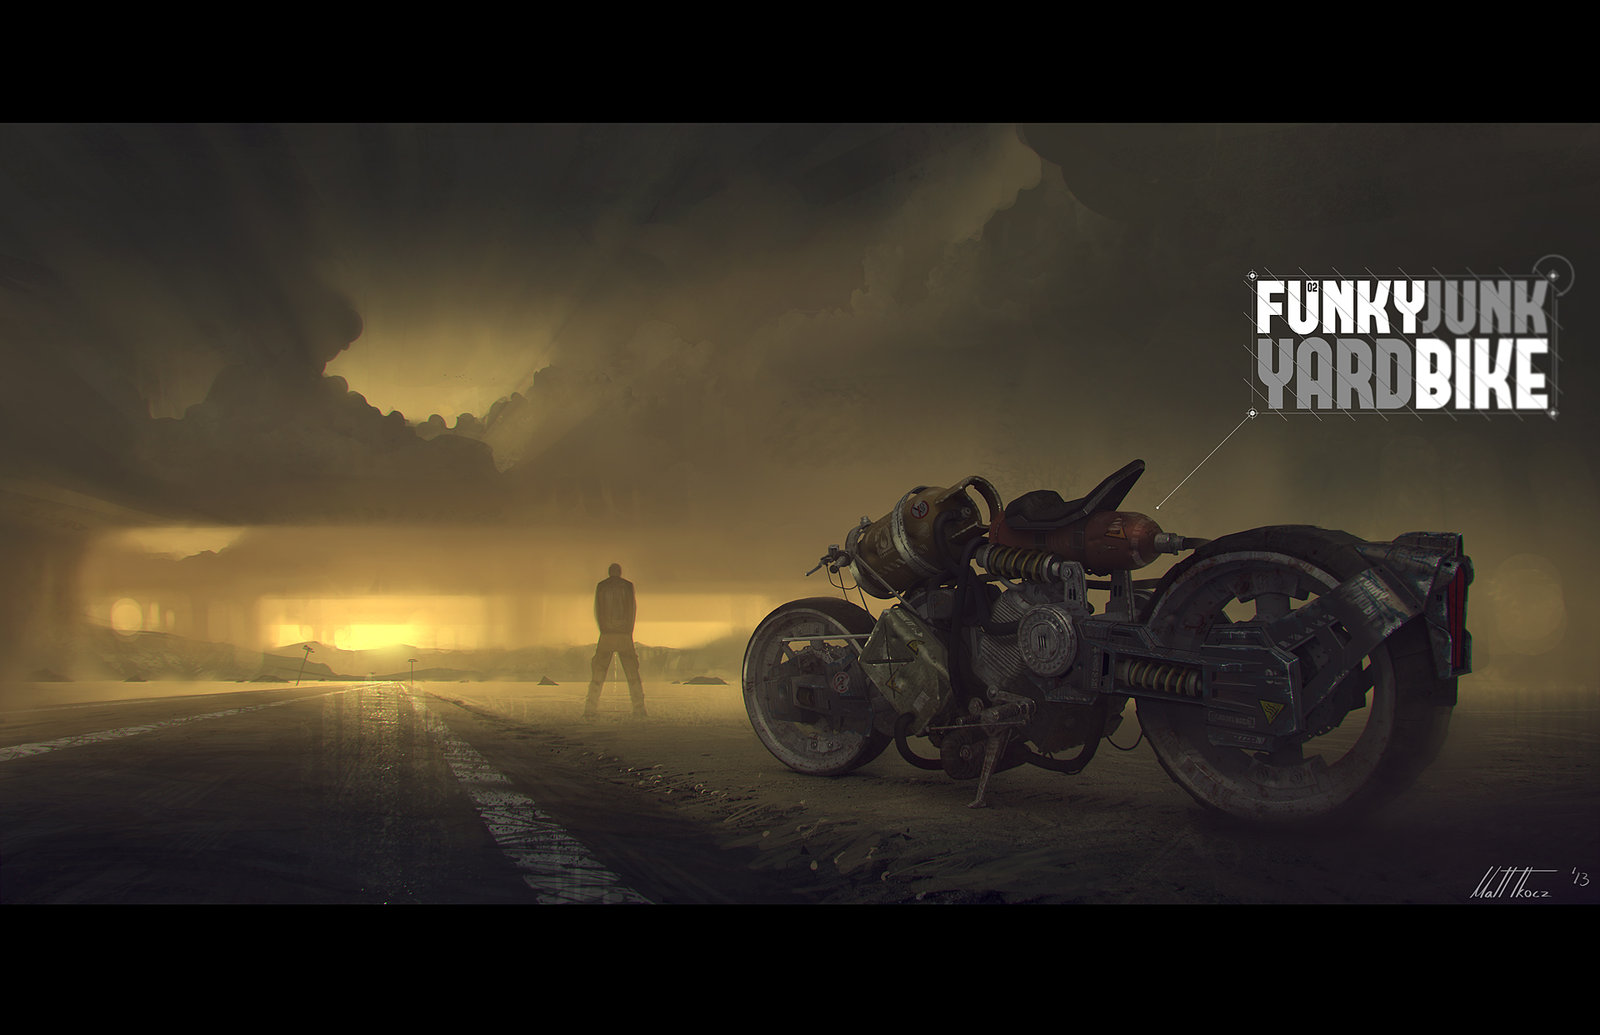 Funky Junk Yard Bike